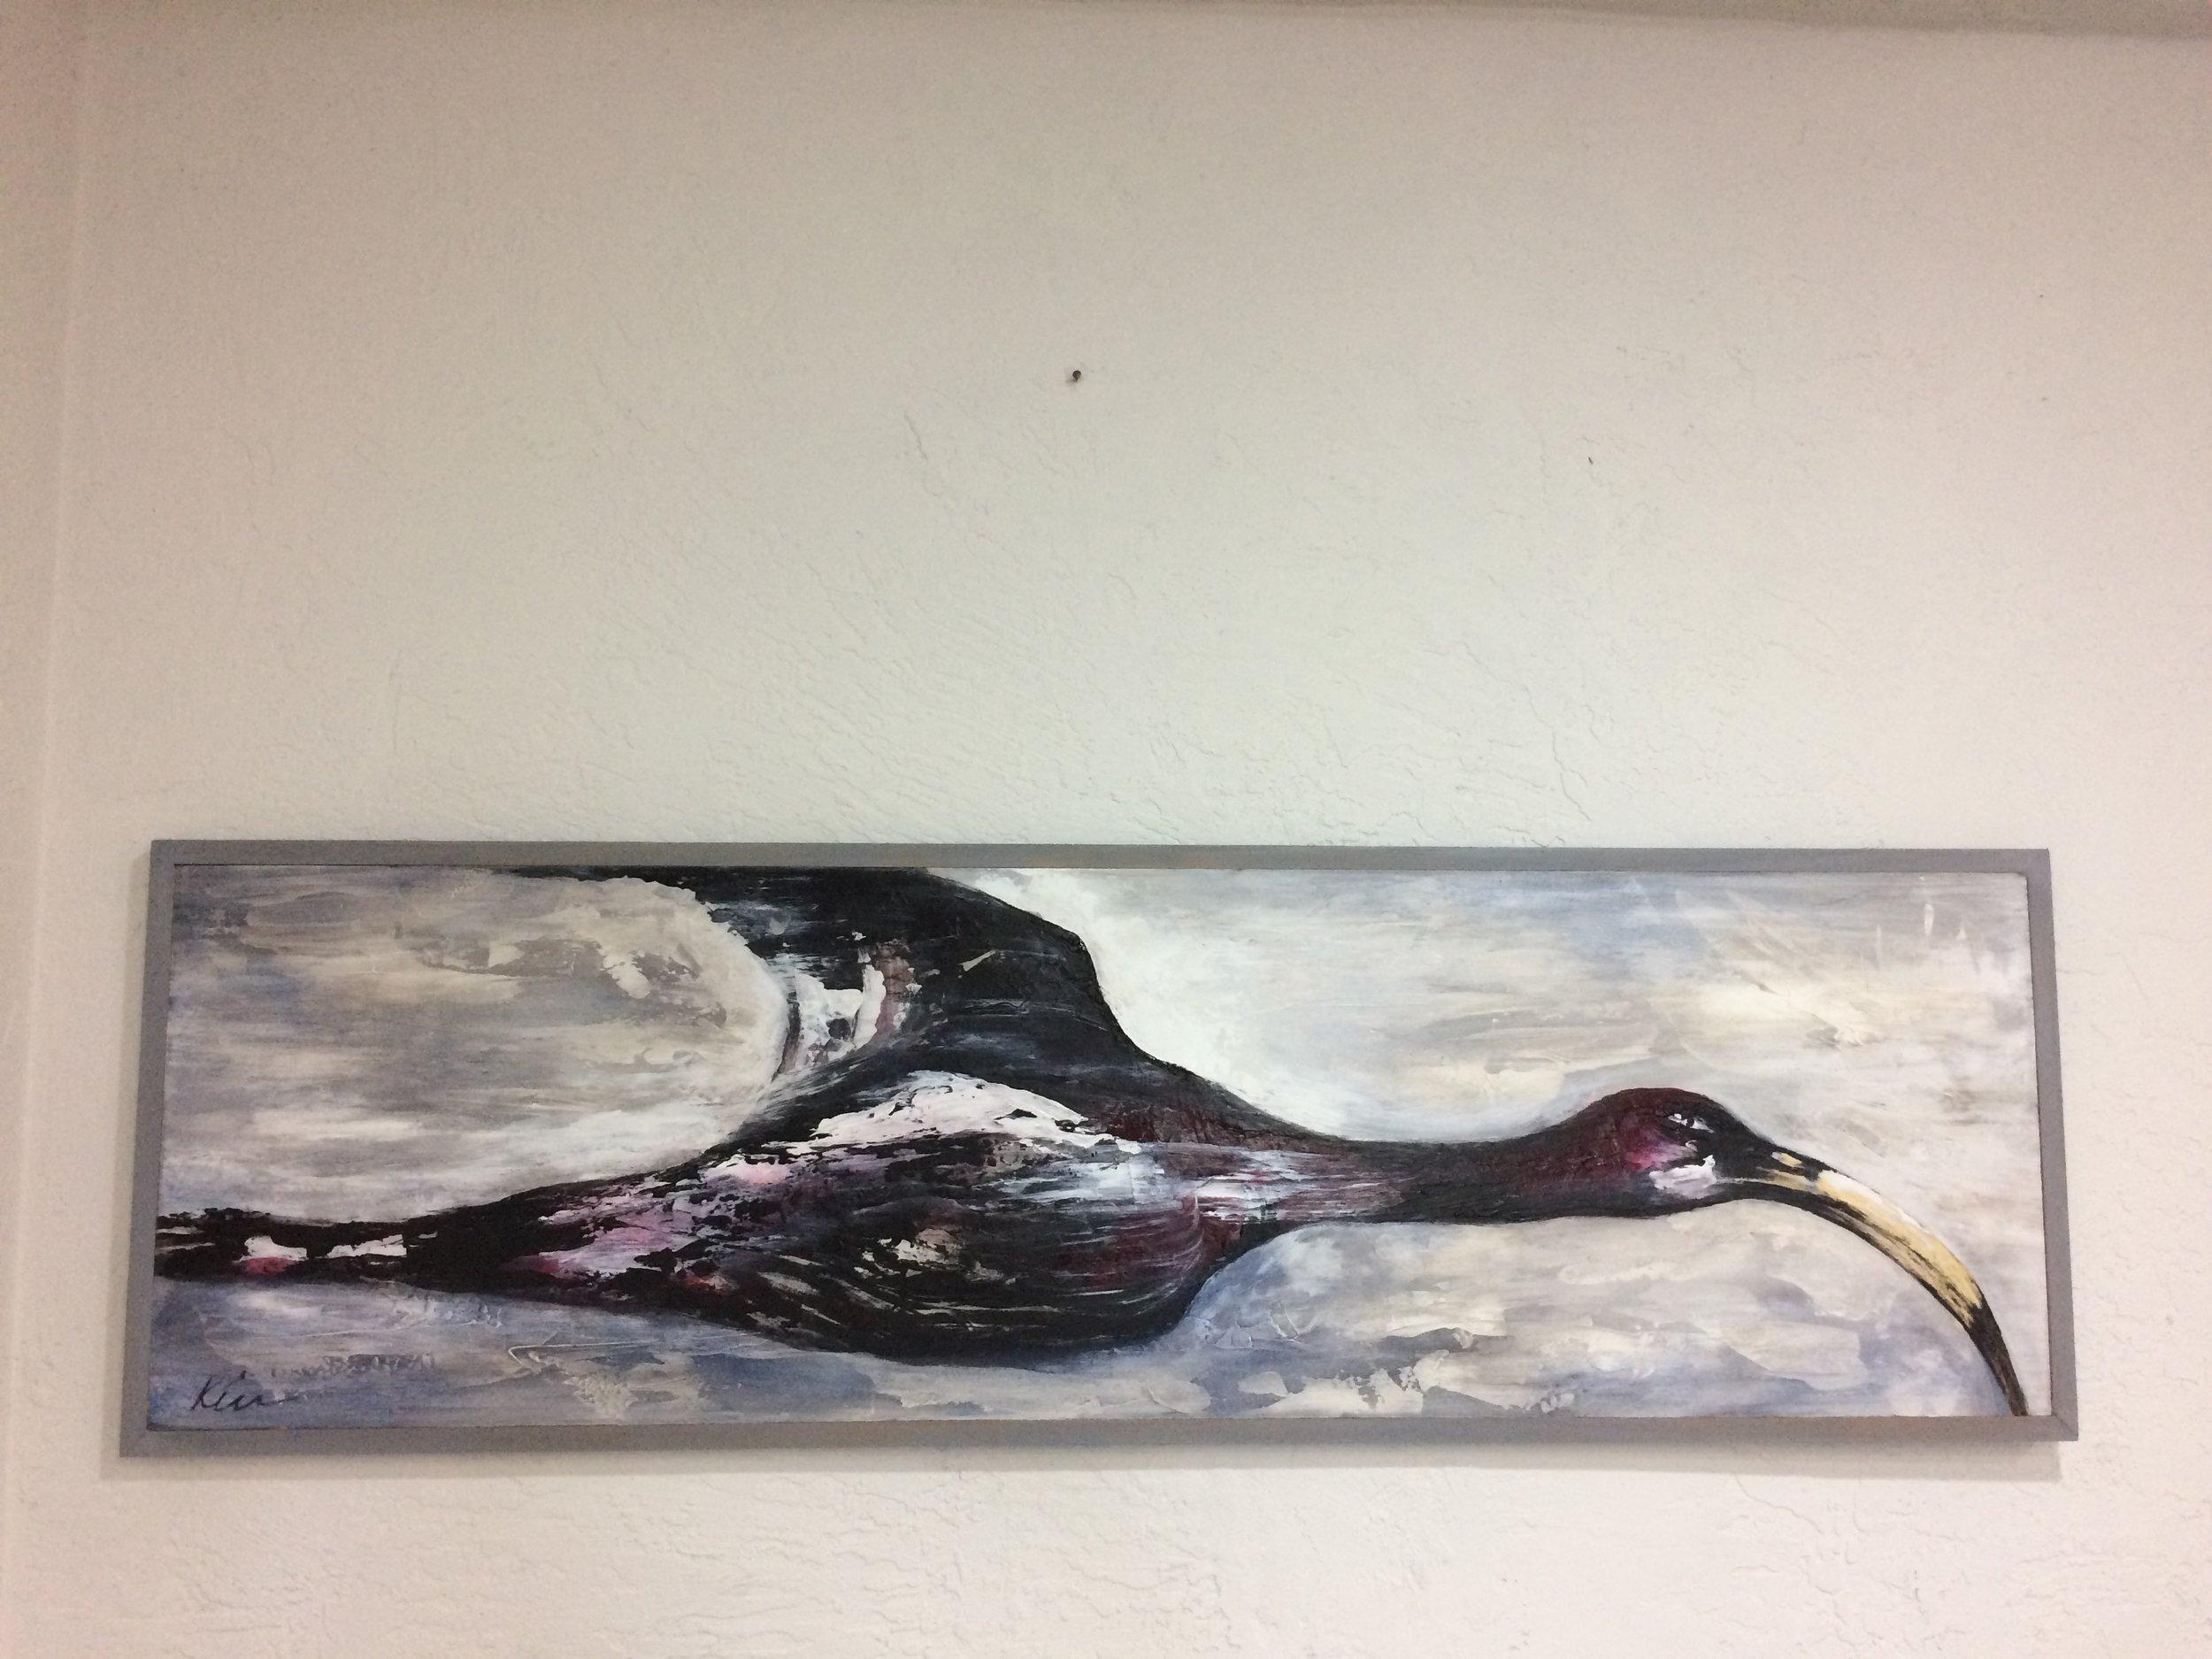 Glossy Black Ibis